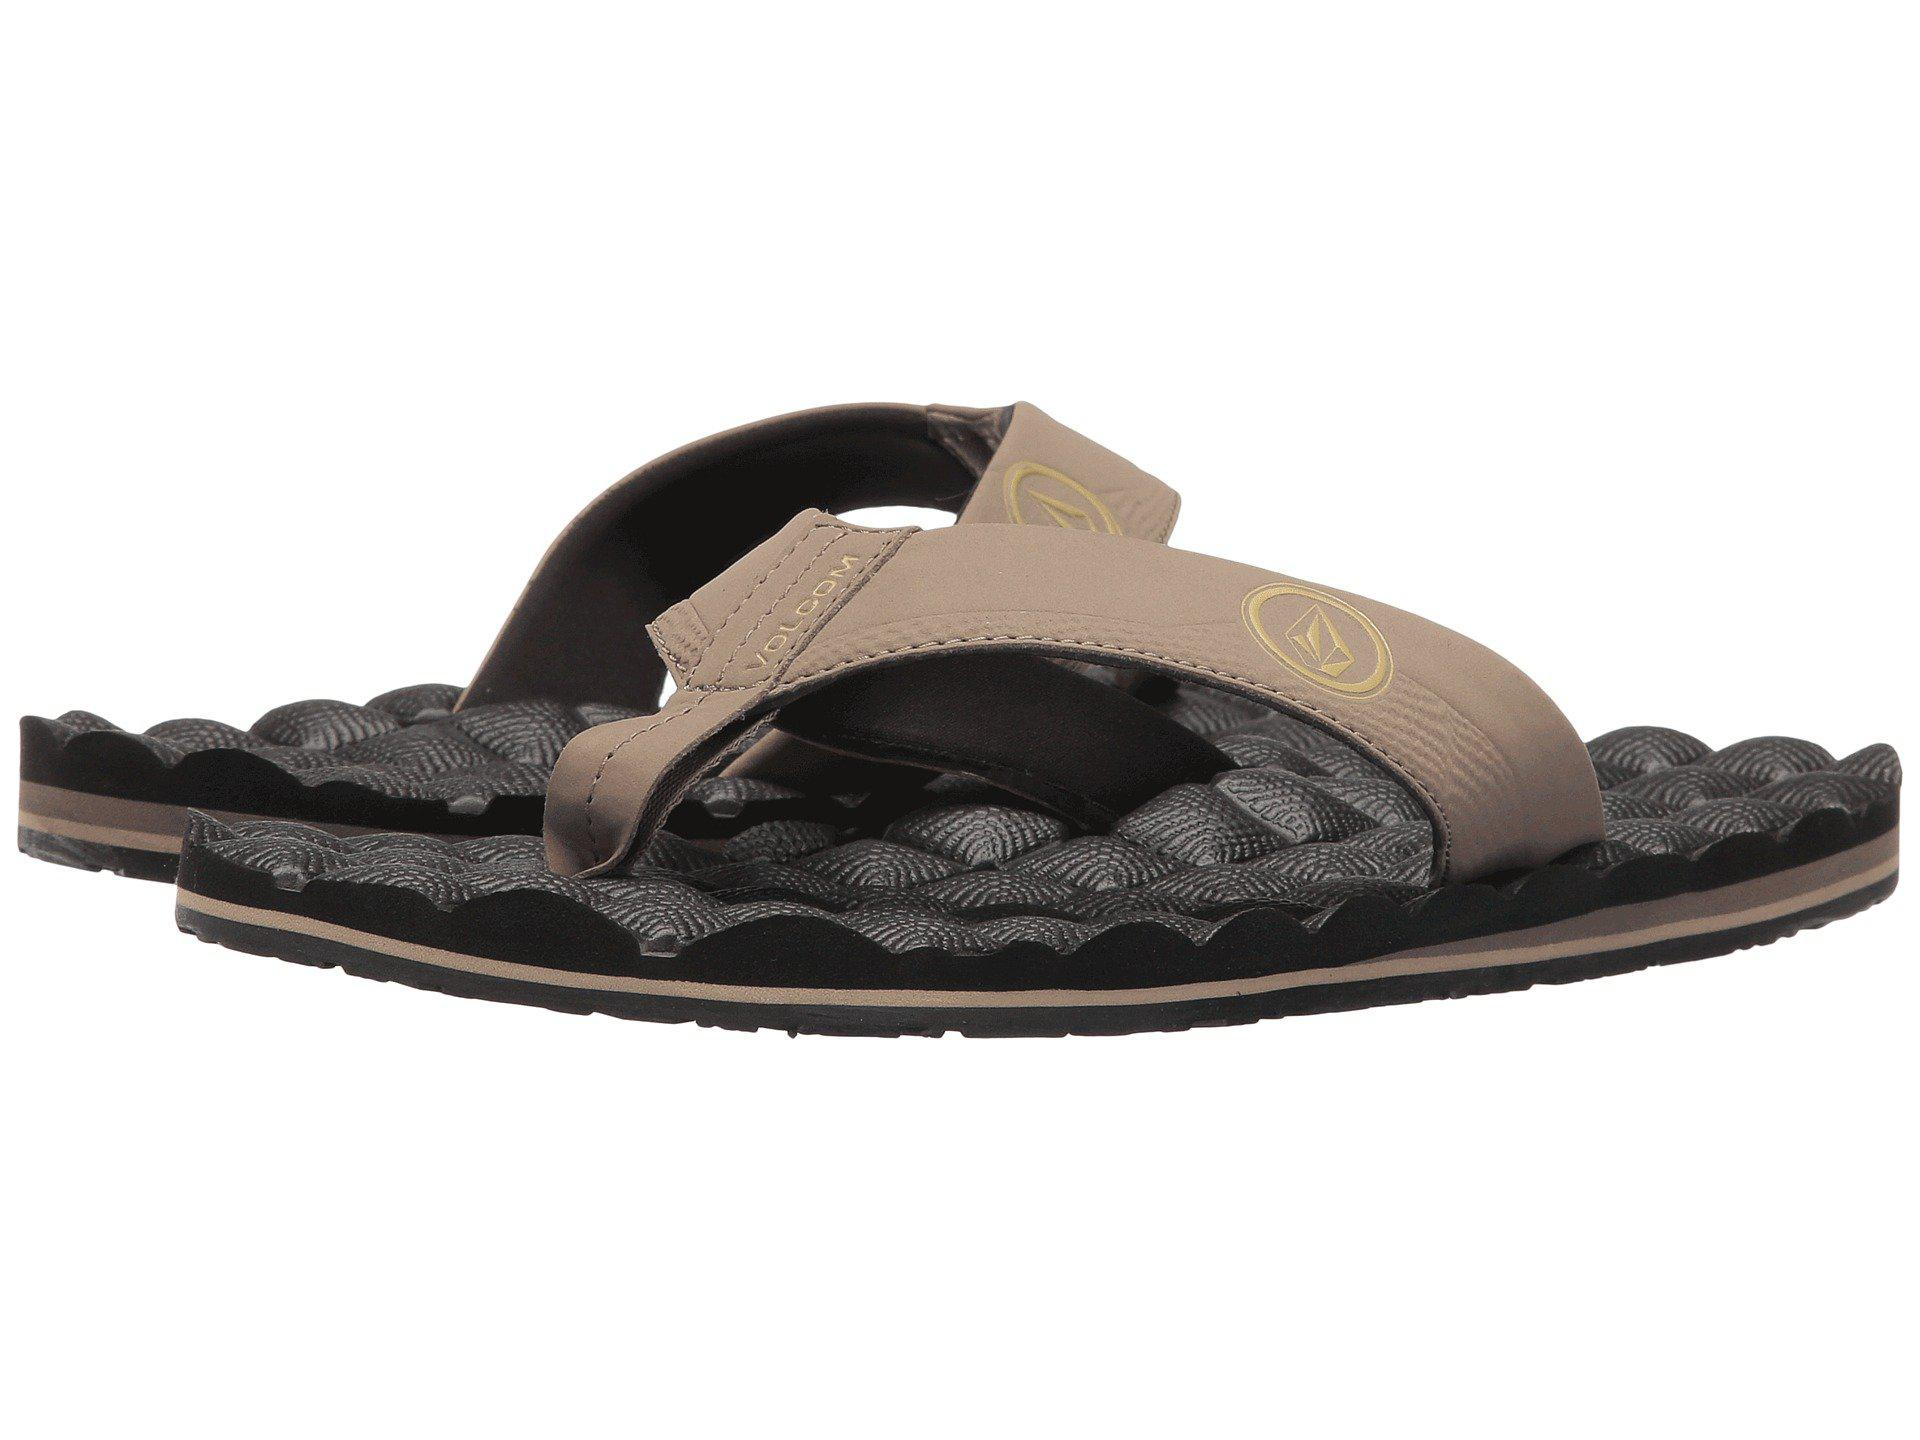 5535fec77f38 Lyst - Volcom Recliner (blue Combo) Men s Sandals in Black for Men